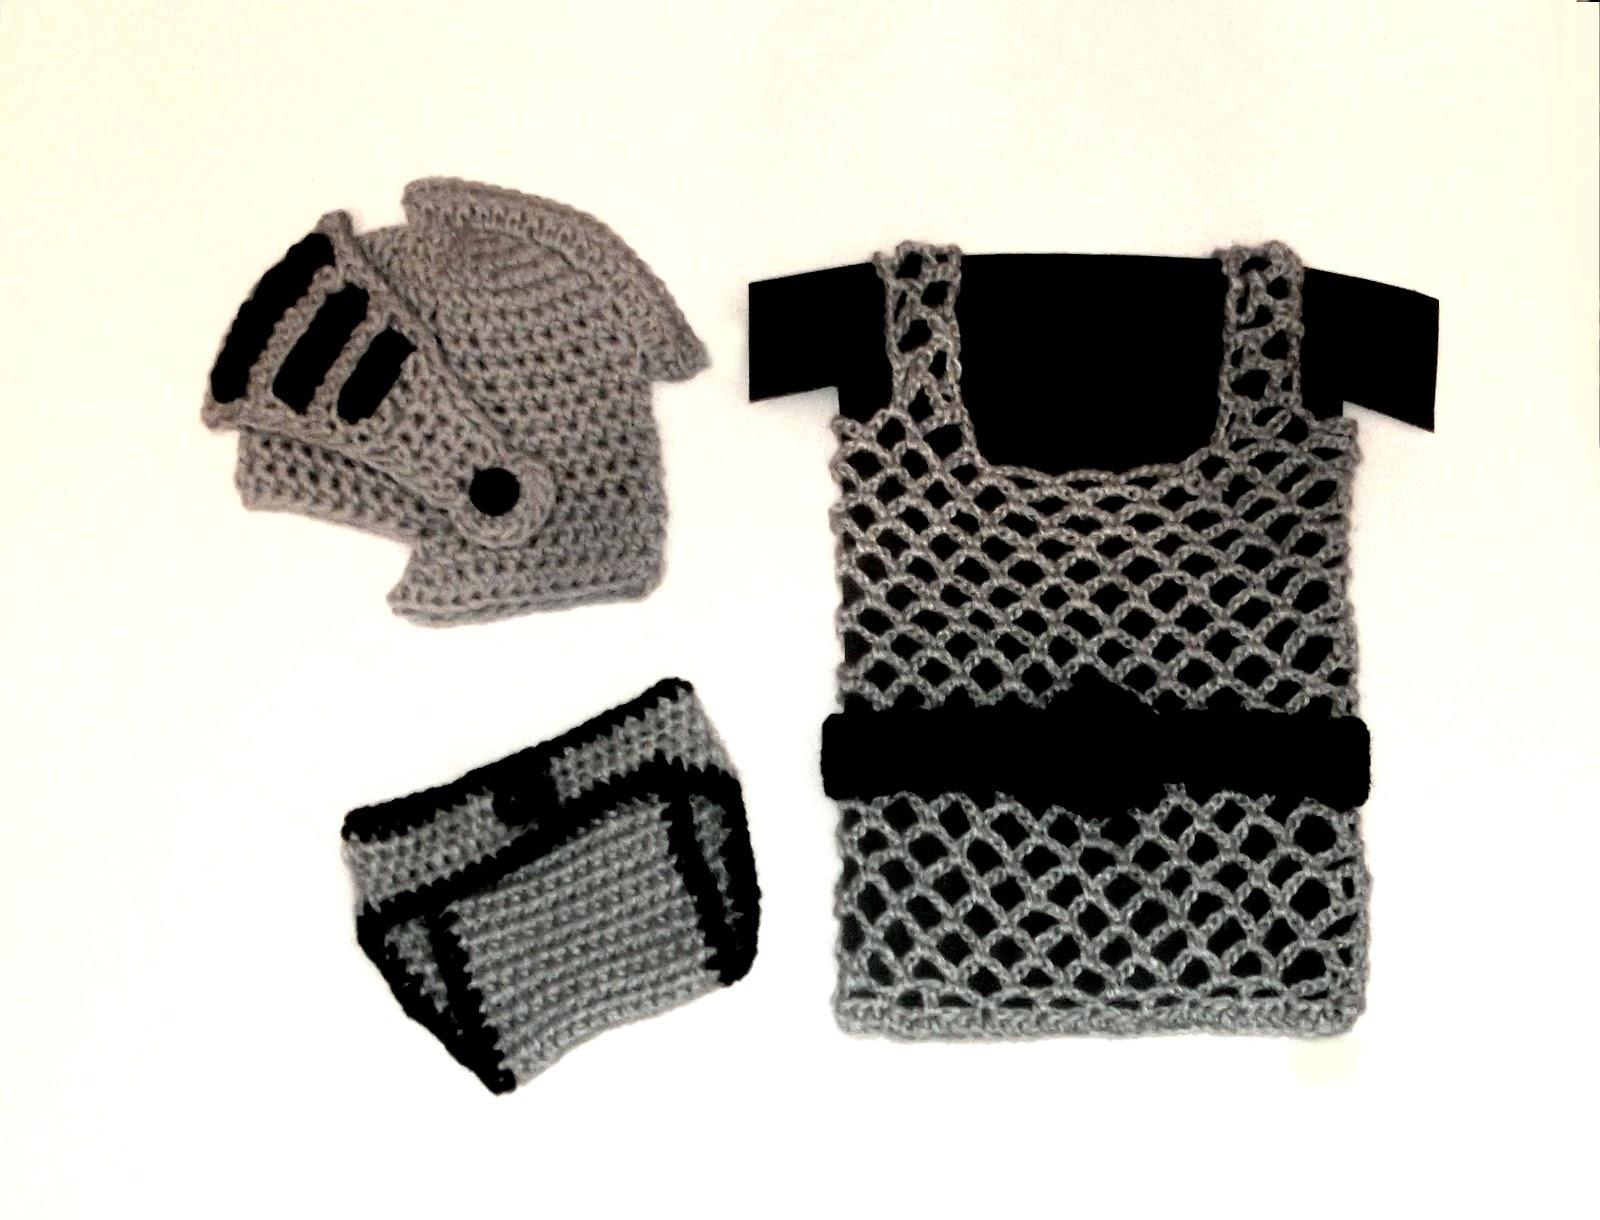 Cute Designs: Knight Helmet / Diaper Cover / Chainmail vest Crochet ...